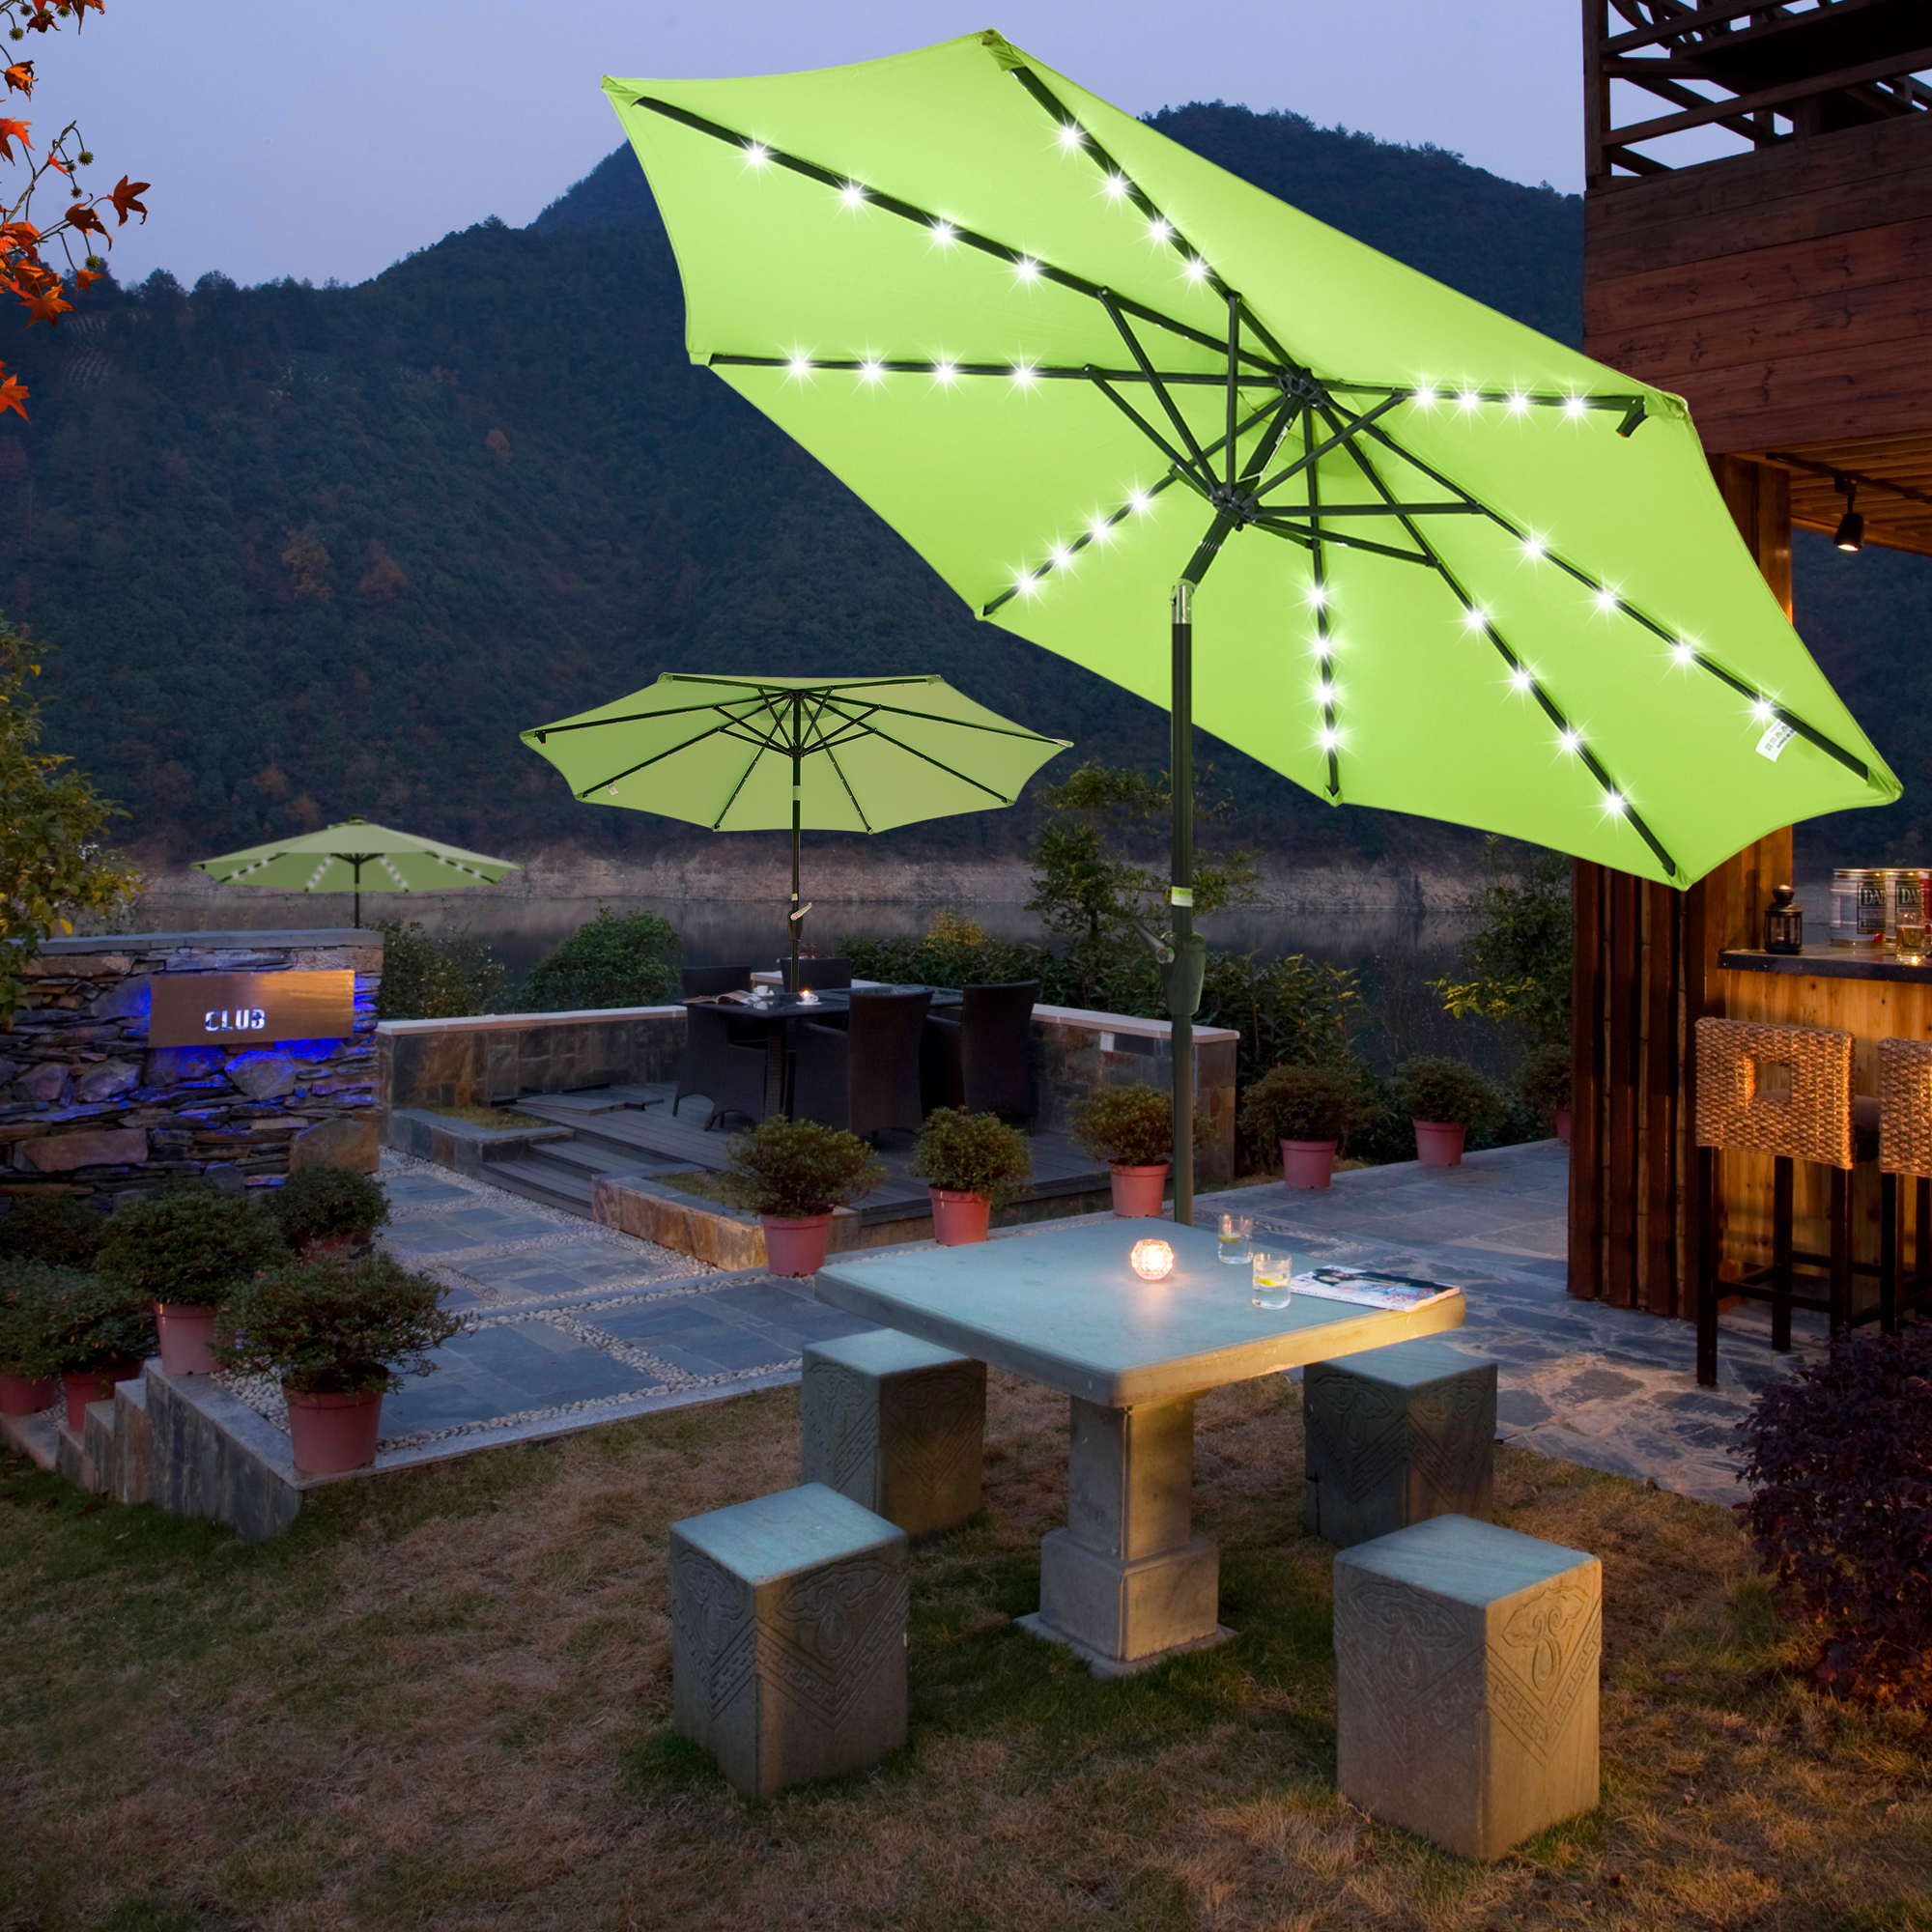 thumbnail 13 - 9' Patio Outdoor Umbrella Solar LED 8 Rib Garden Parasol Yard Deck Table Shade